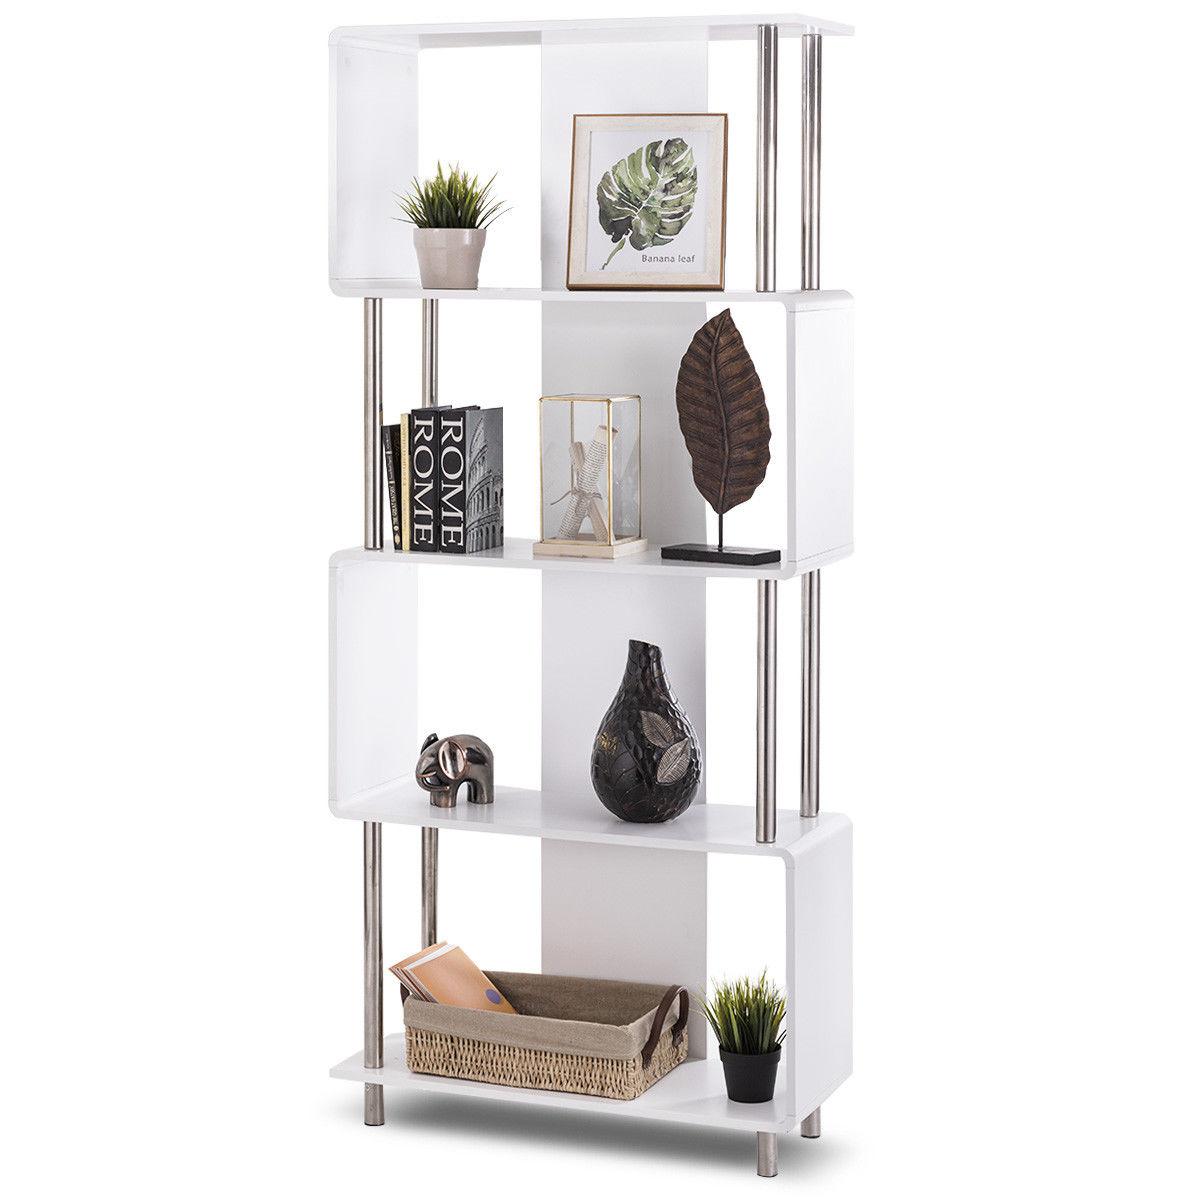 Giantex Industrial Style 4 Shelf Modern Bookcase Living Room Storage Display Unit Bookshelf White Home Furniture HW61410WH 1